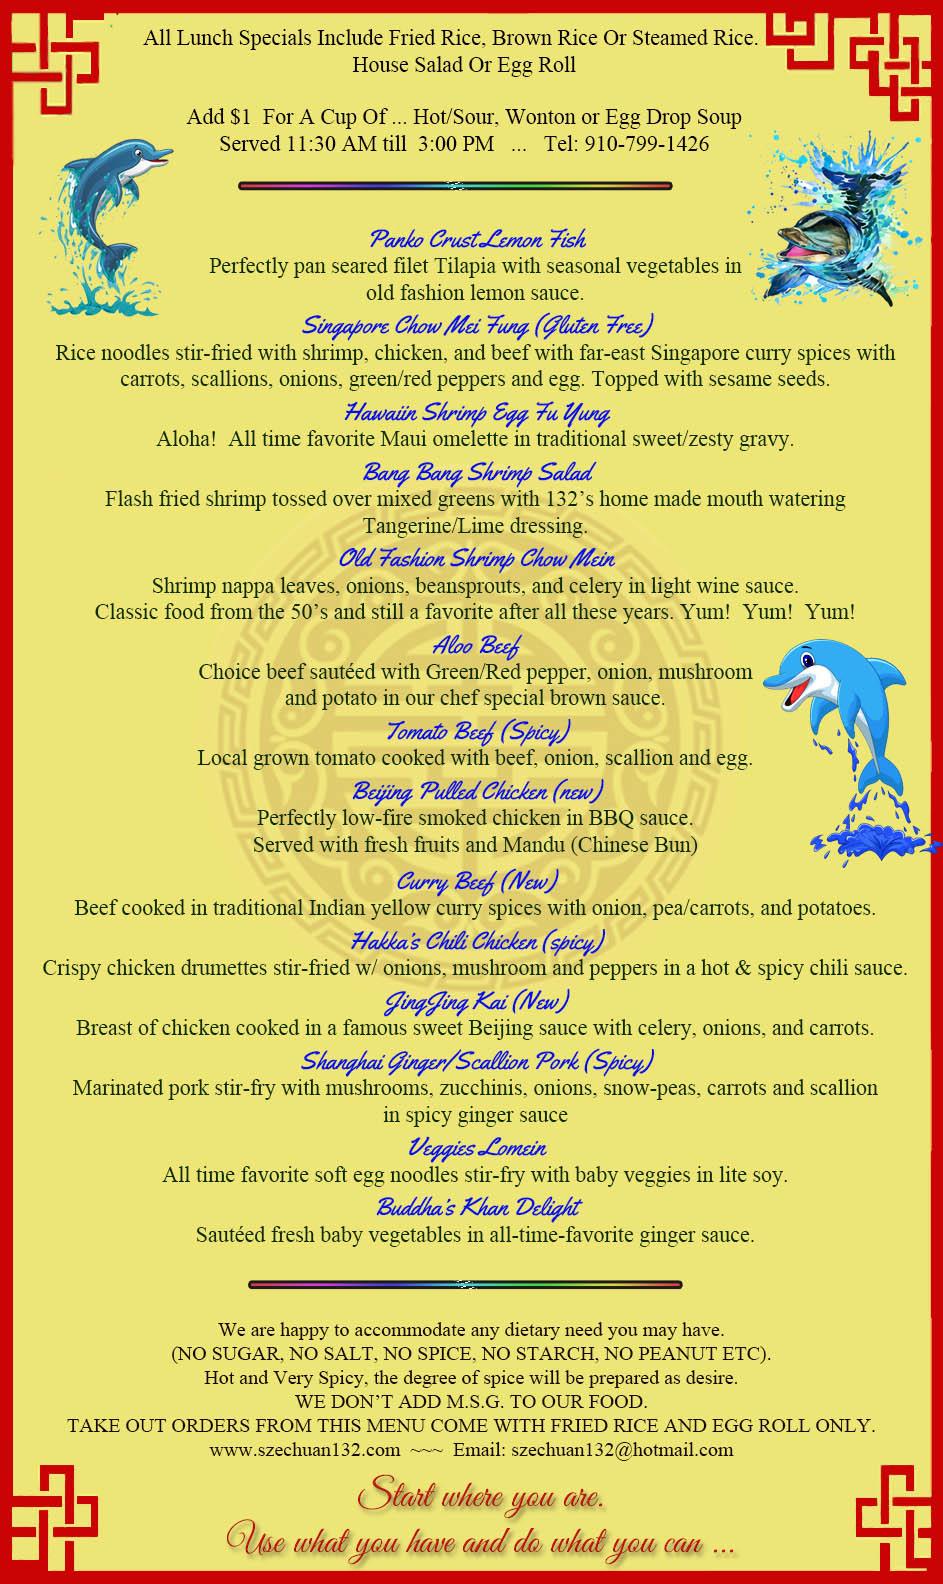 06-23-19 Lunch menu